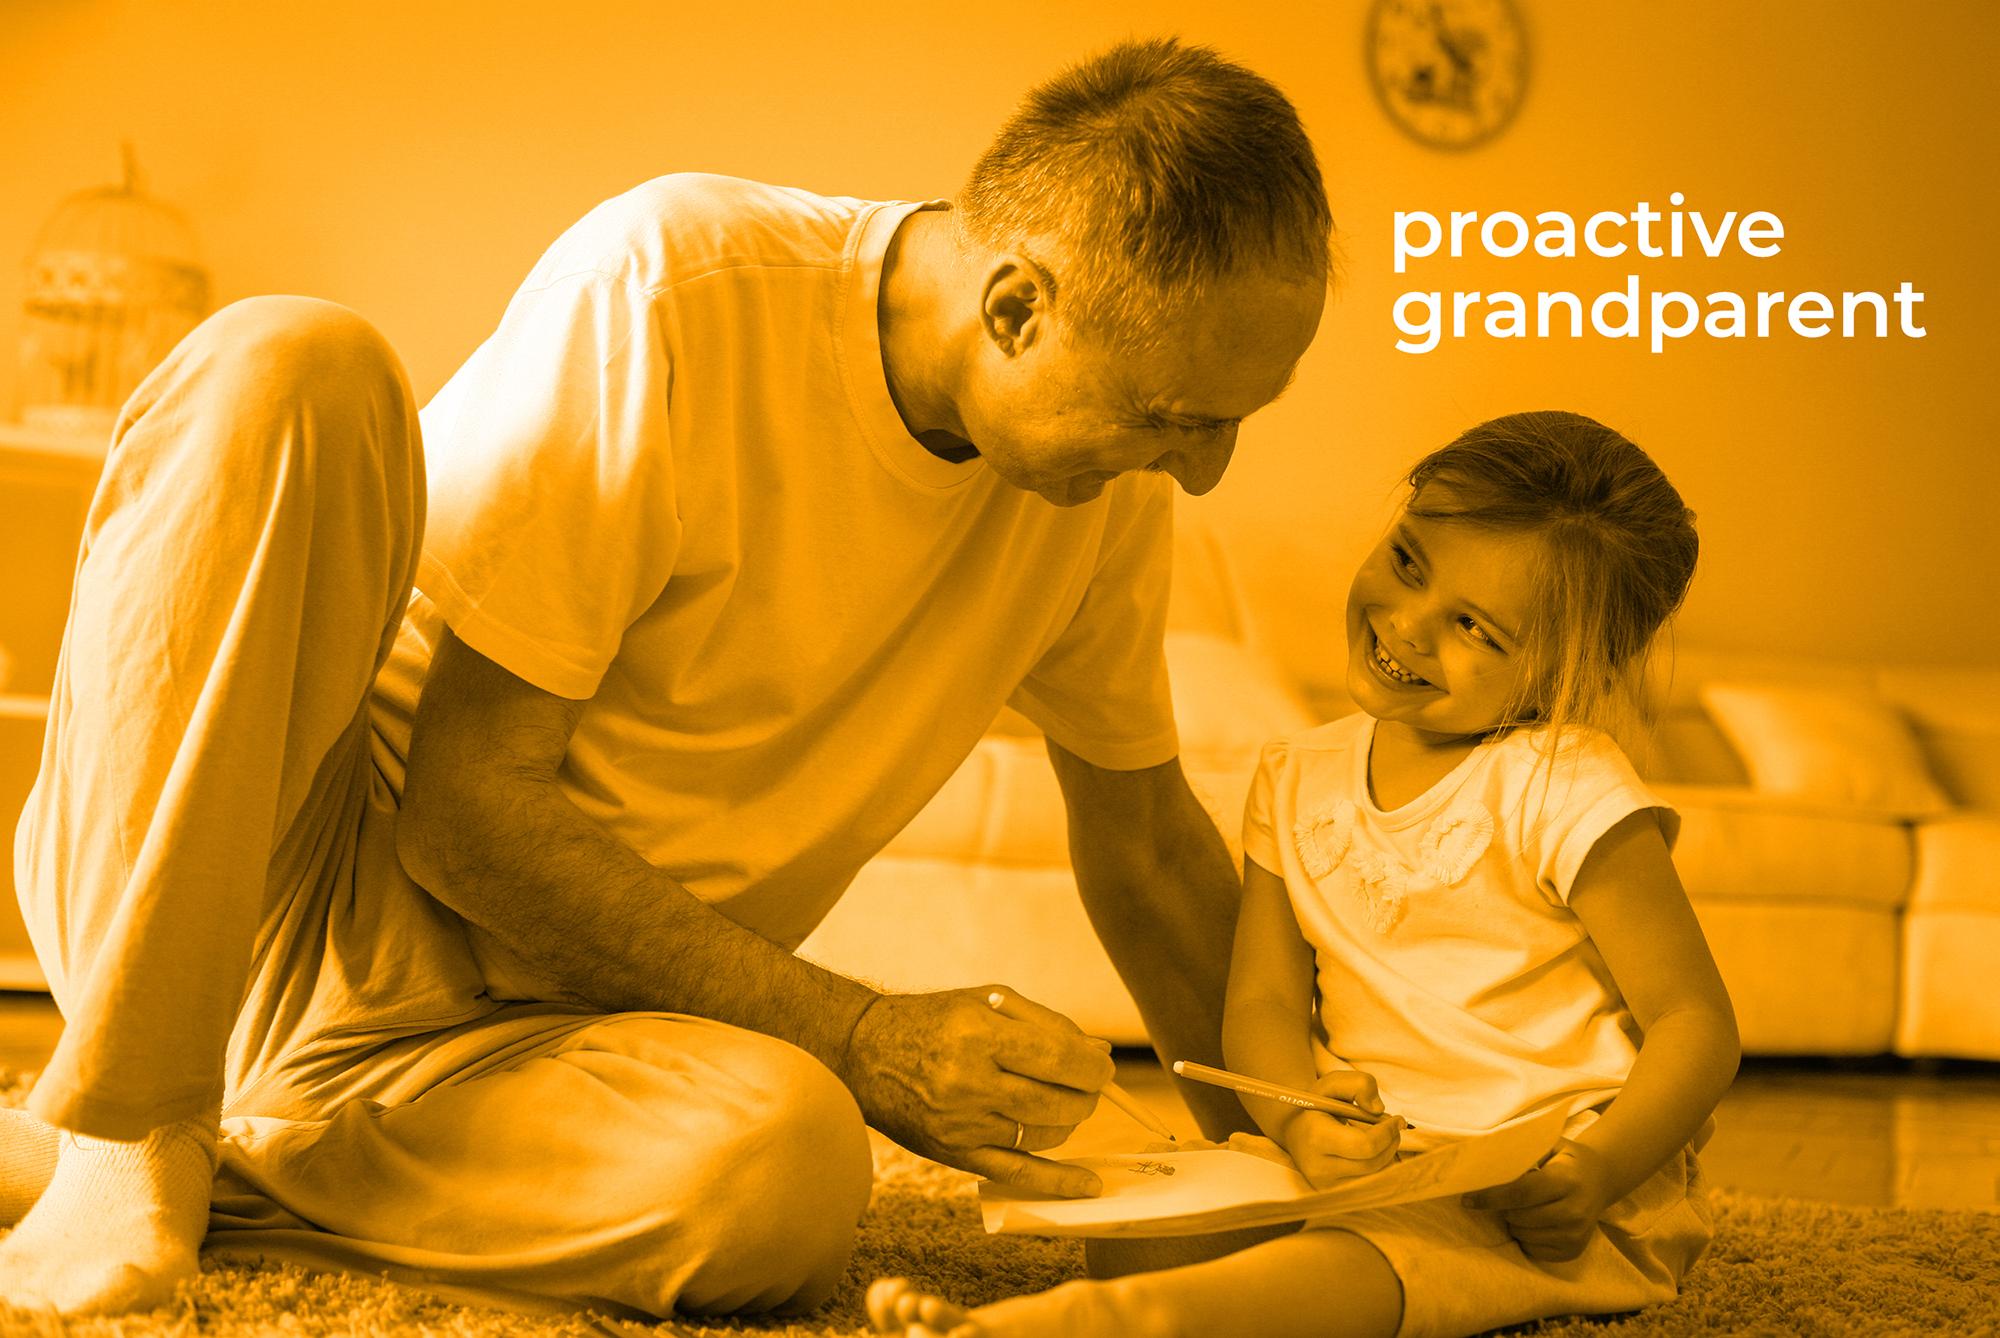 AdobeStock_Grandpa with granddaughter.jpg